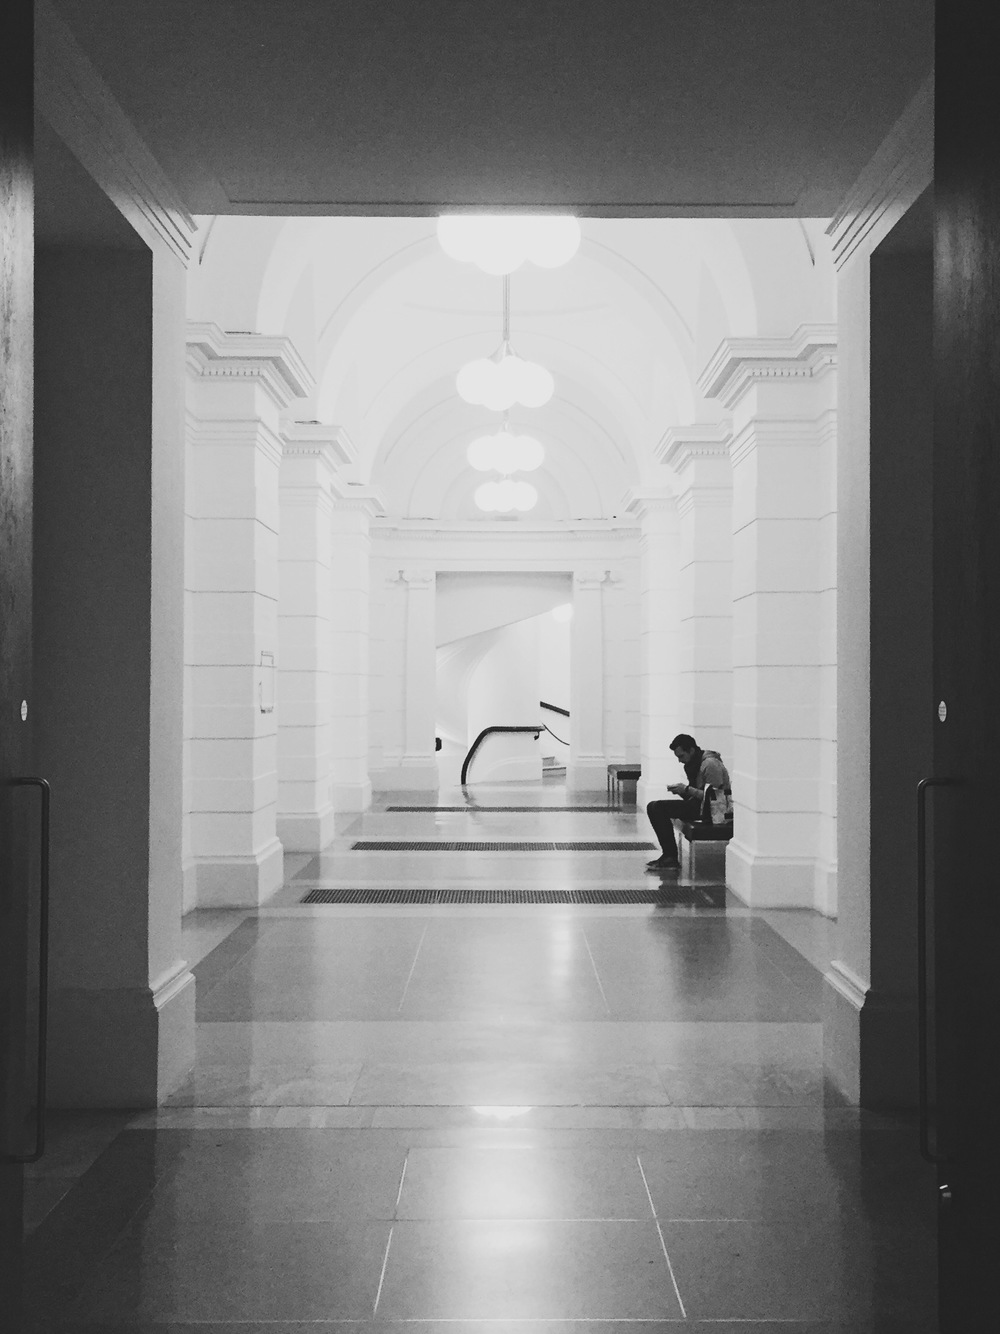 Corridors of Tate Britain